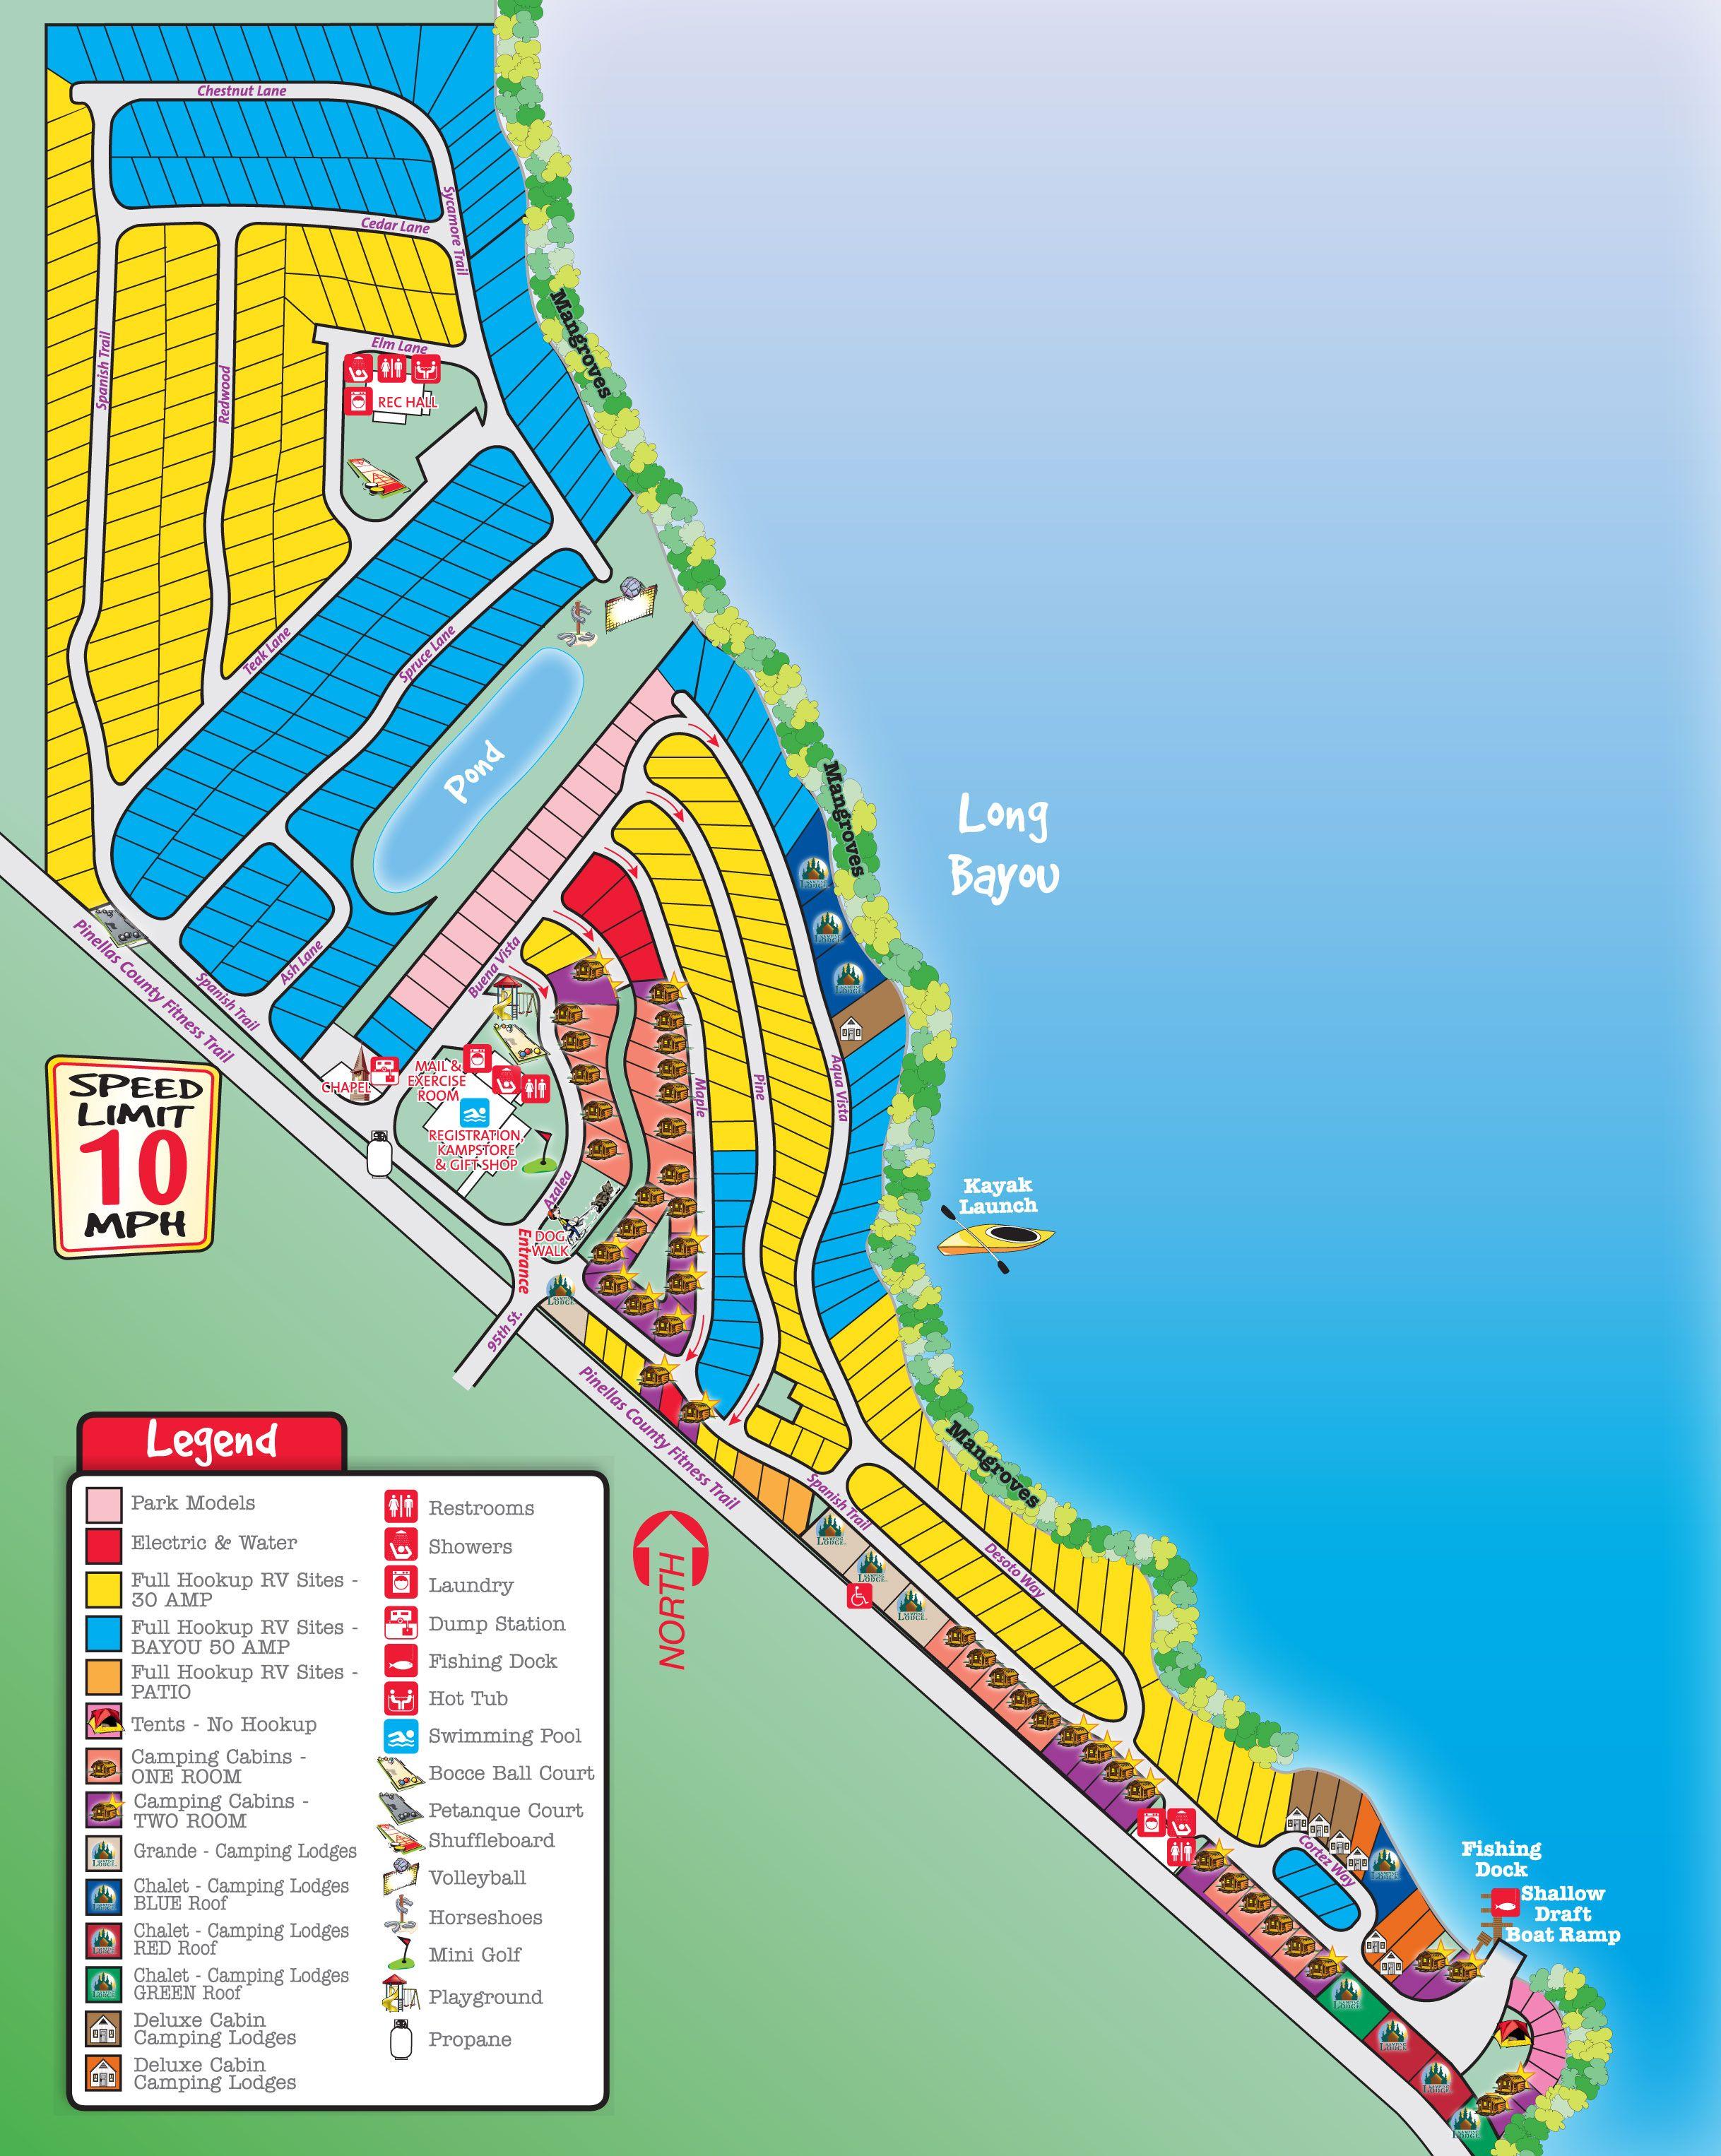 St. Petersburg / Madeira Beach Koa Campsites Start At $51.50 Per - Koa Florida Map